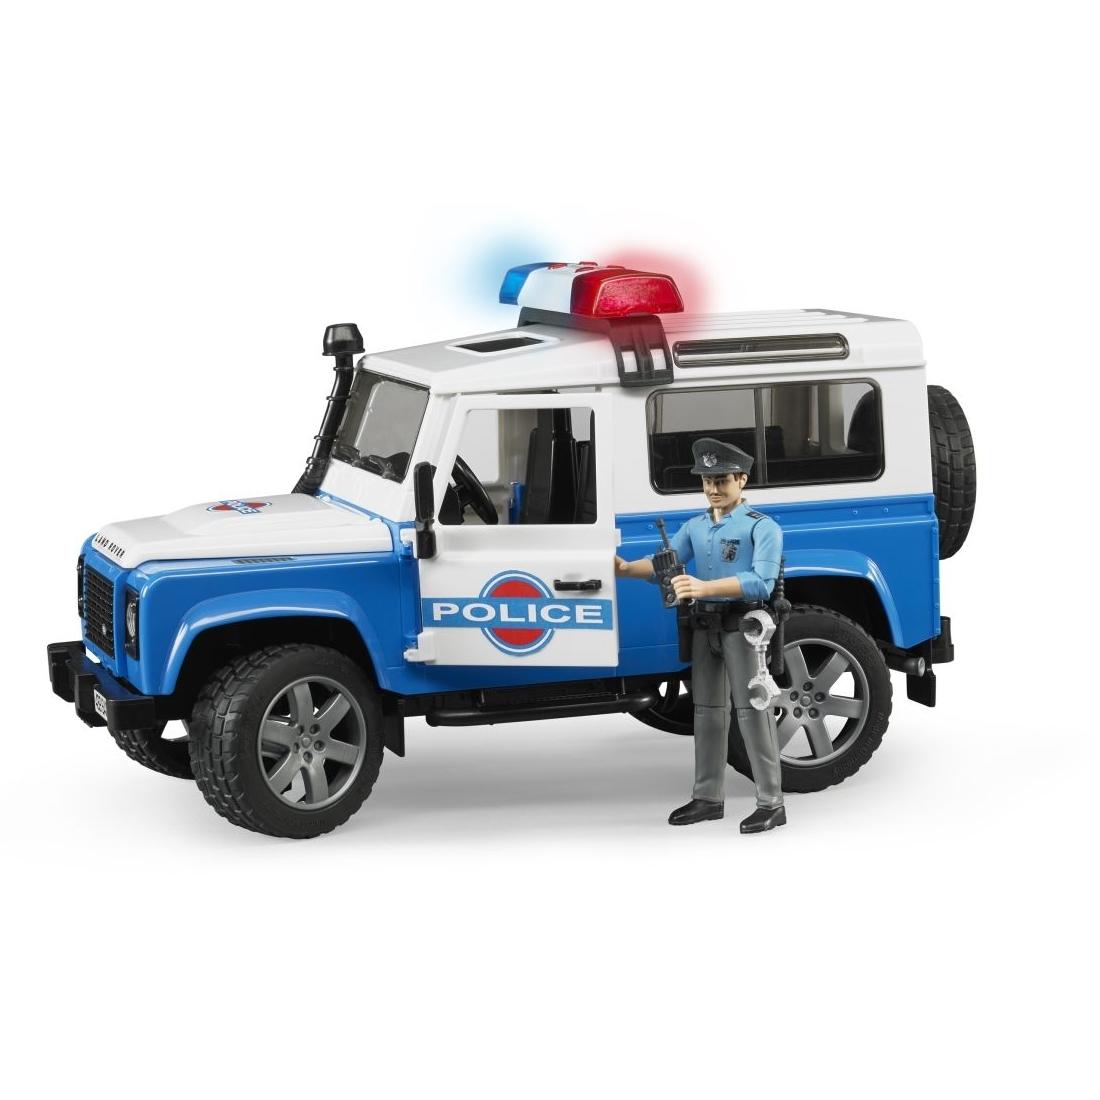 ����������� Land Rover Defender Station Wagon ������� � ��������